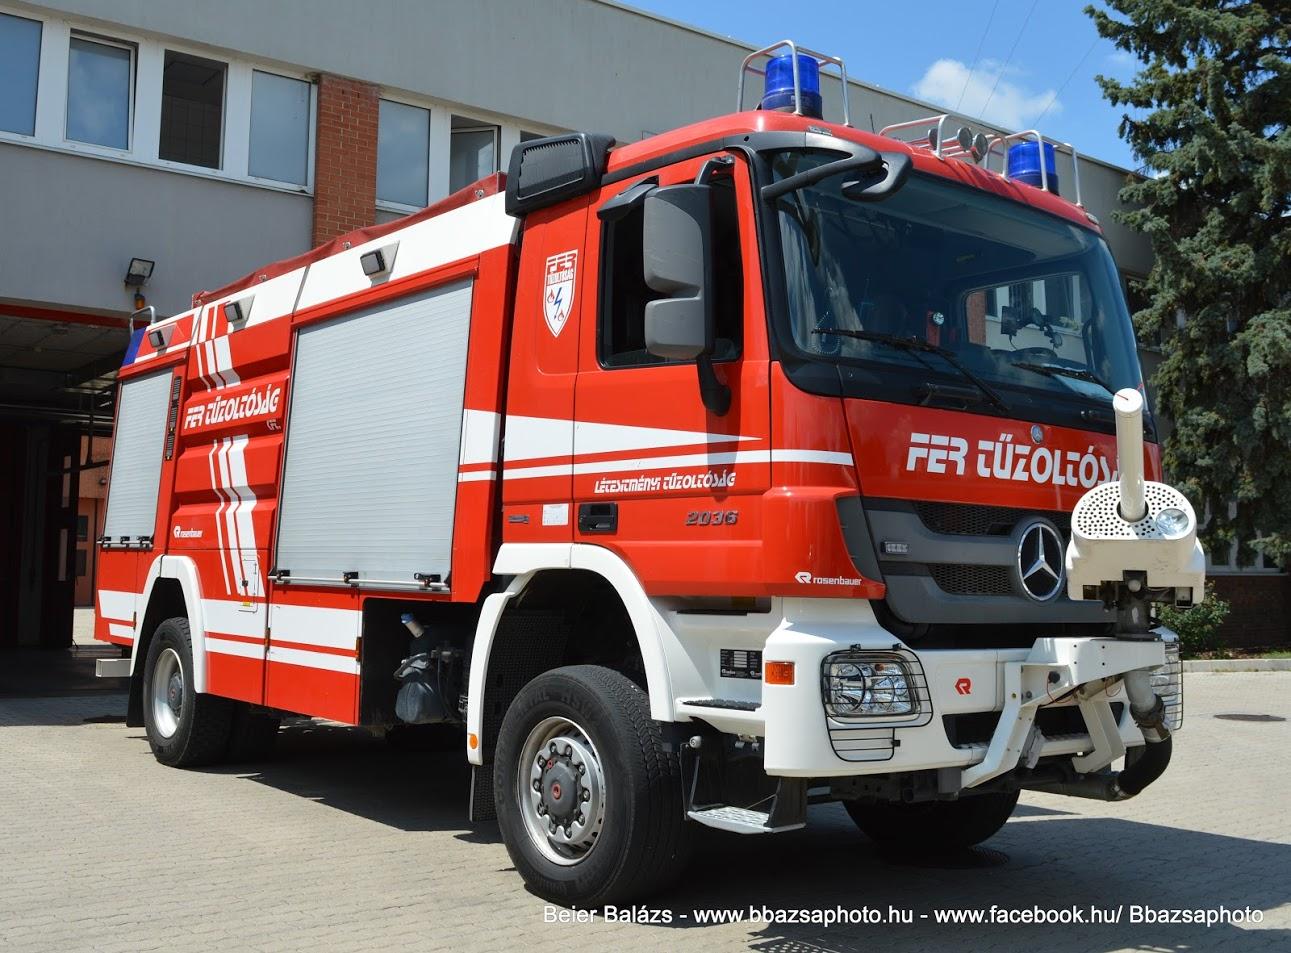 Mercedes Actros 2036 Rosenbauer – FER